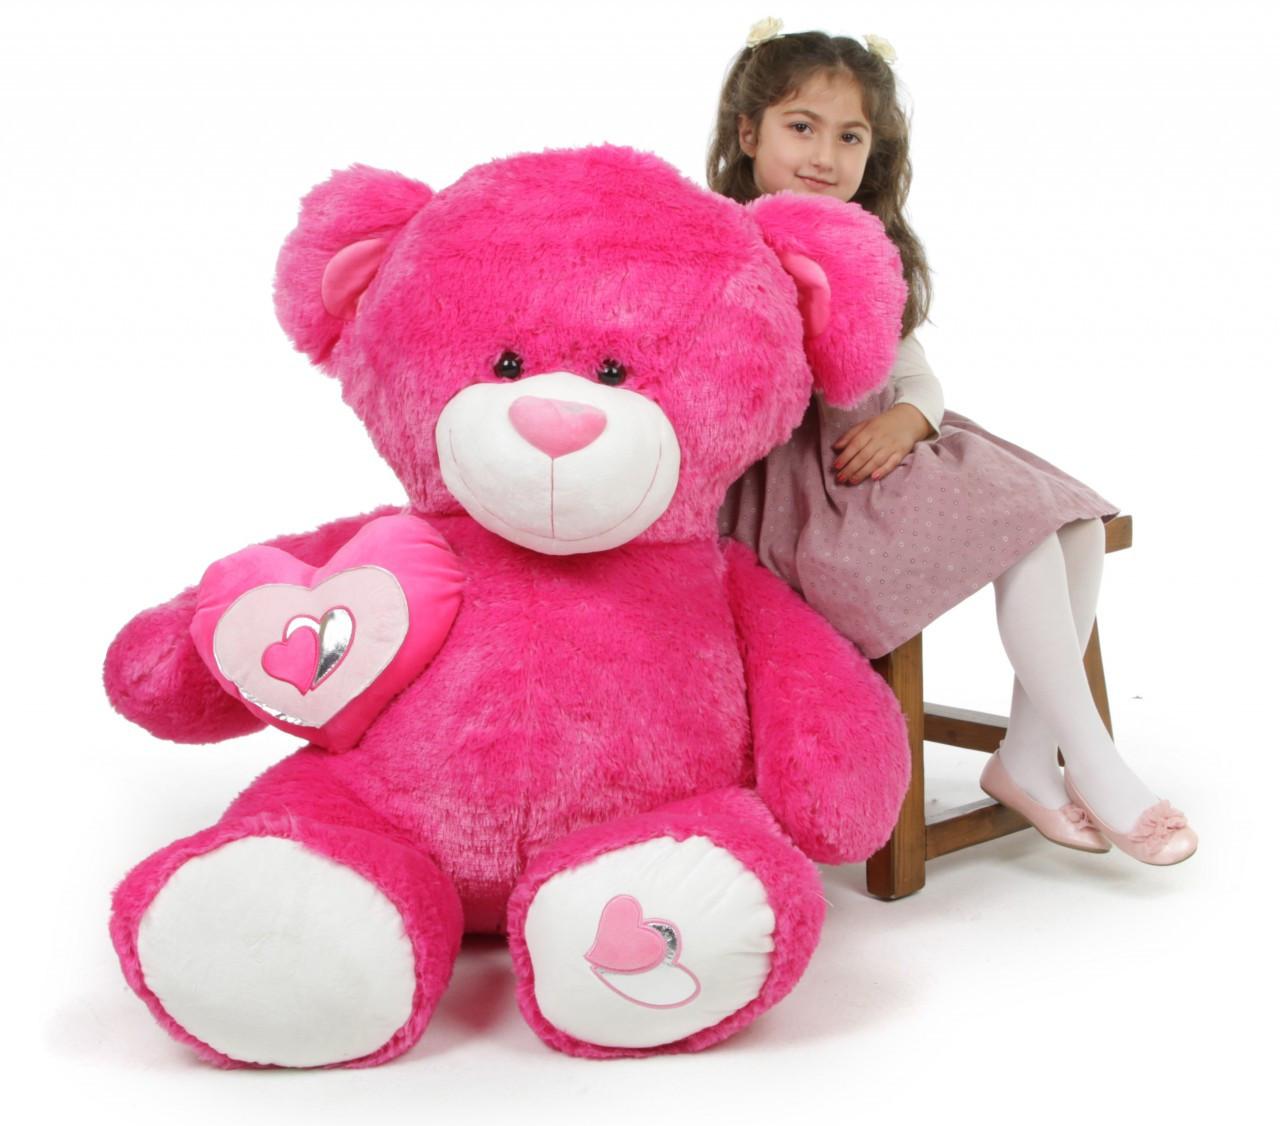 ChaCha Big Love Irresistible Huge Hot Pink Teddy Bear 47 in